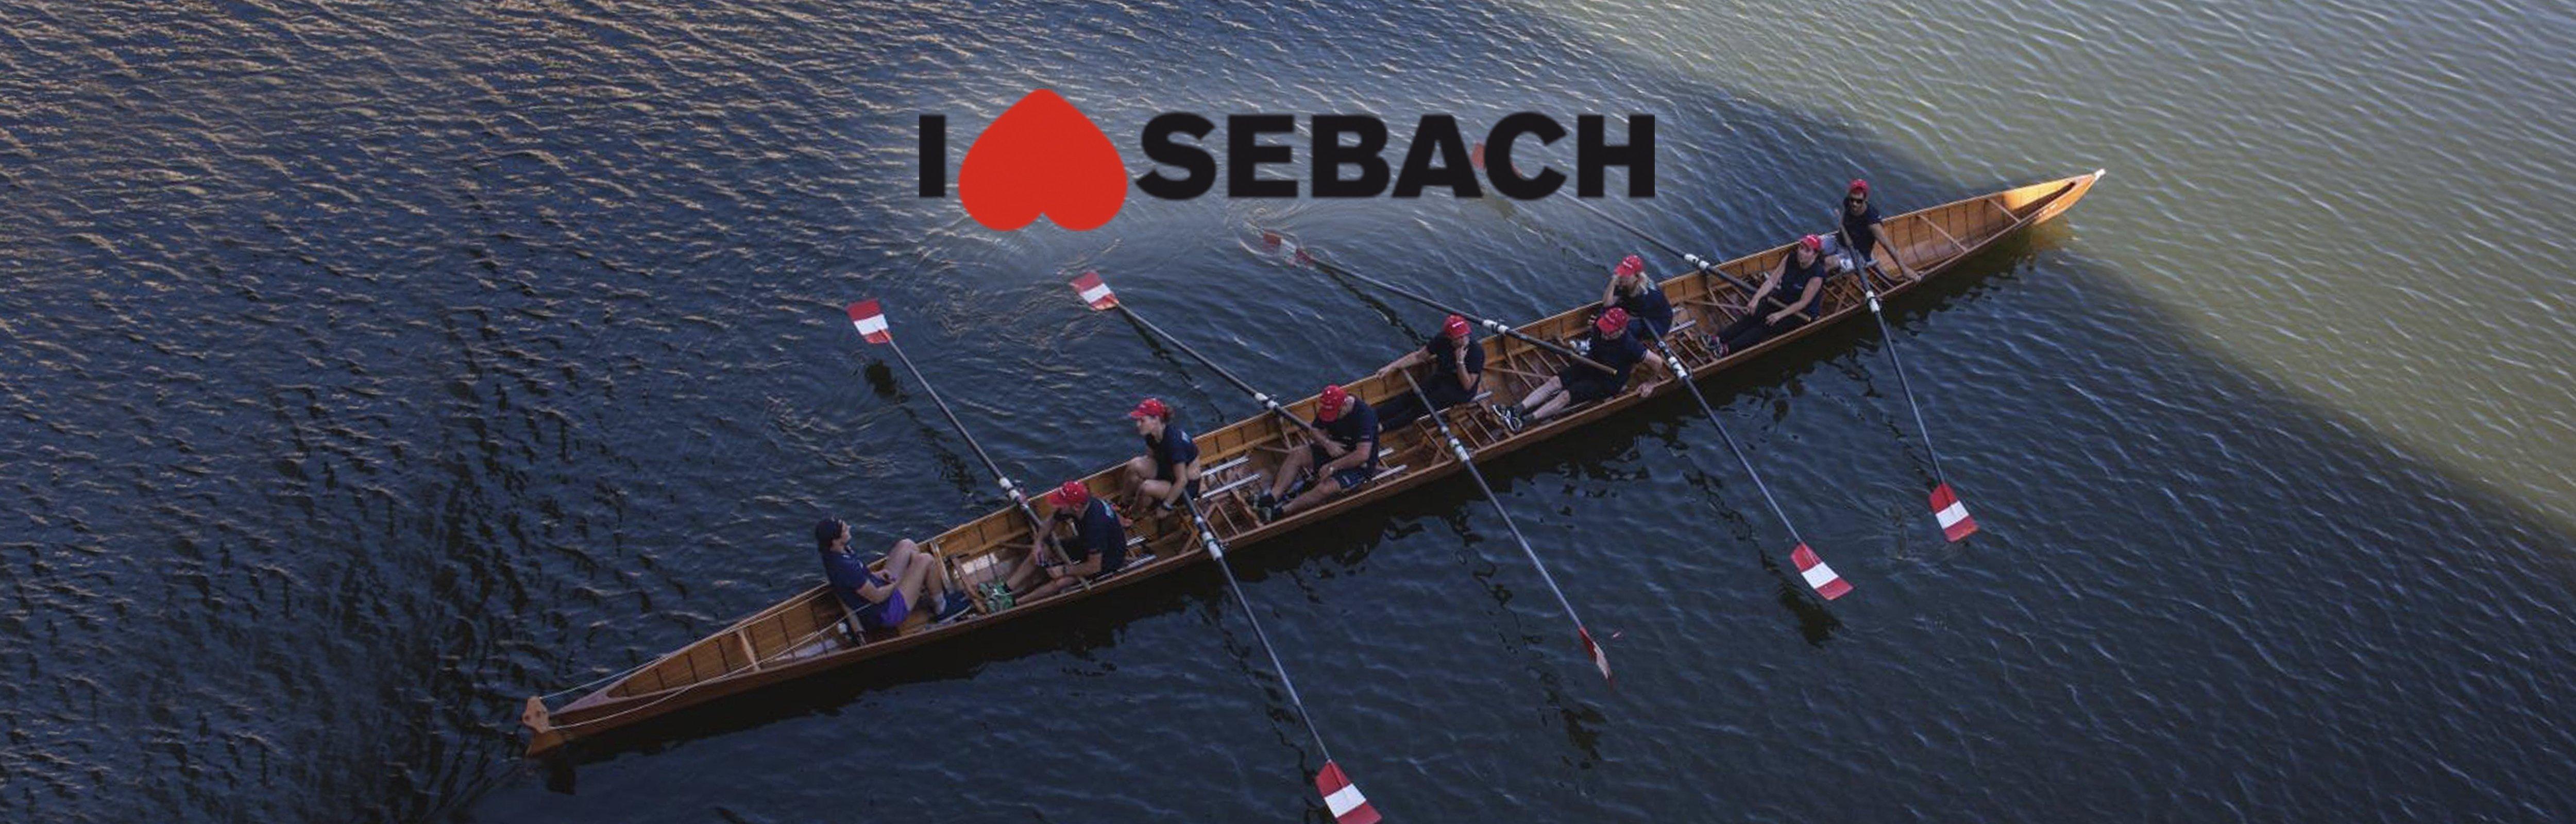 SEBACH ospite dei canottieri di Firenze